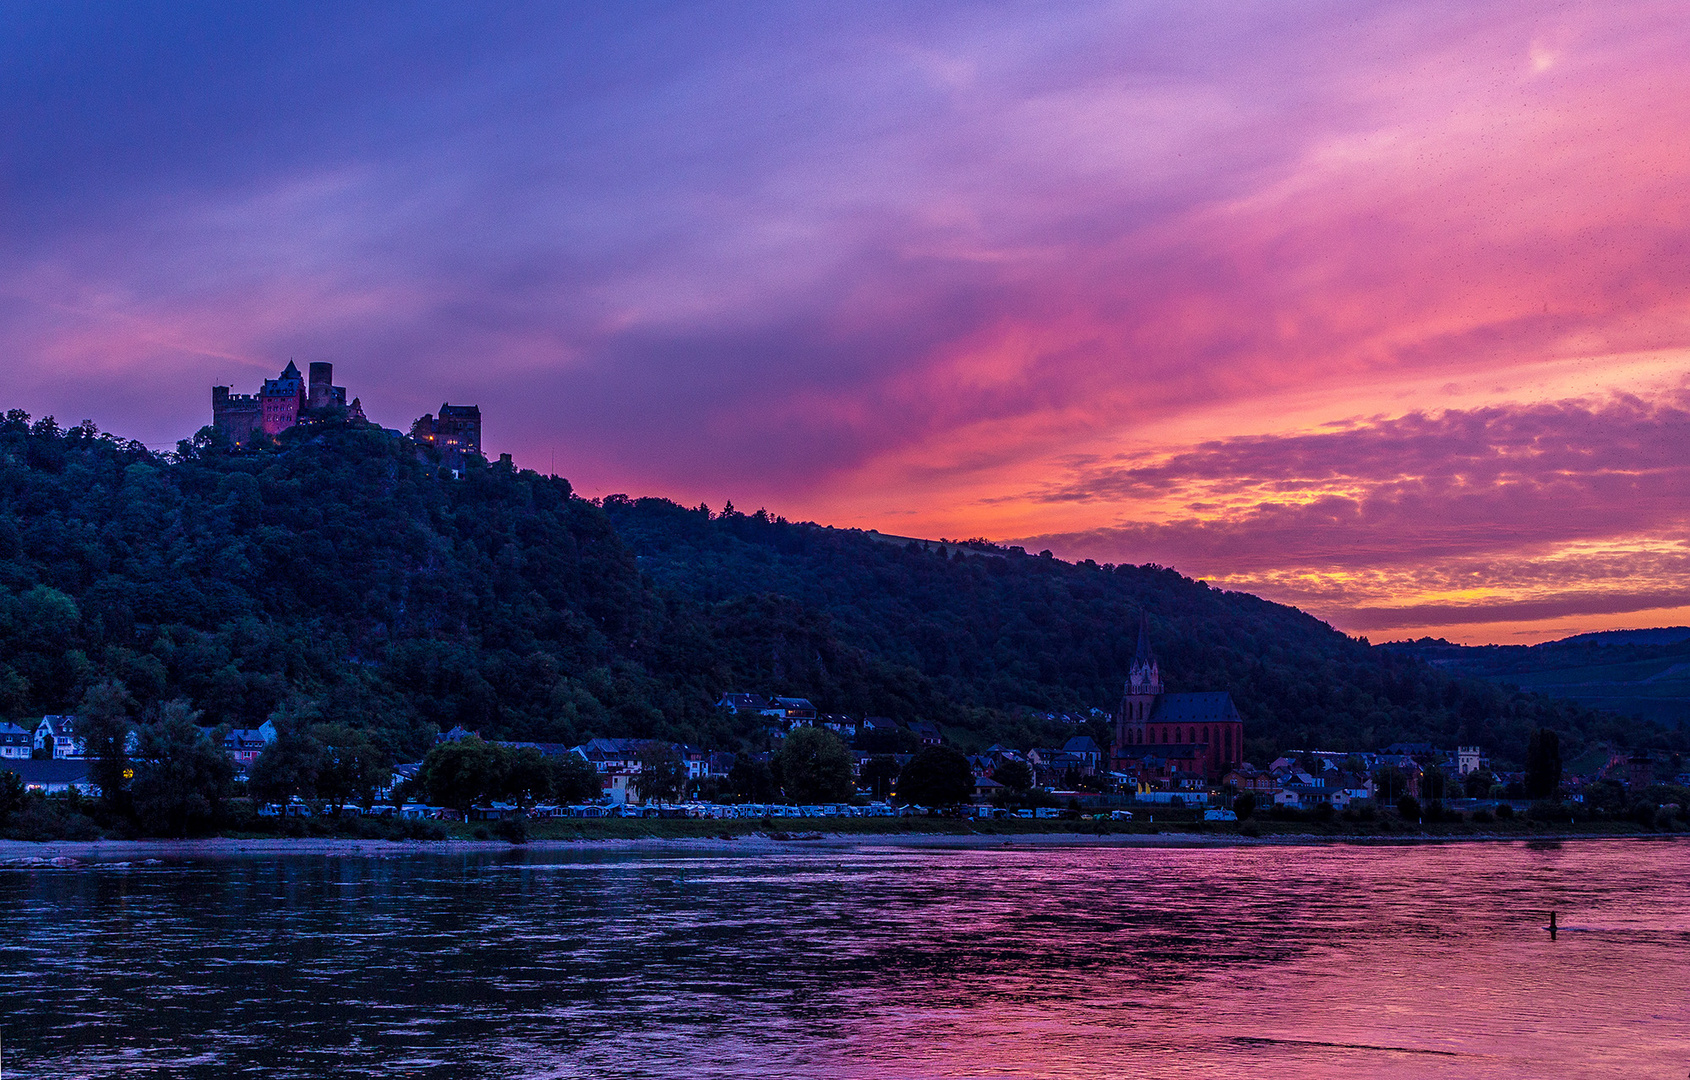 Verträumte Burg nach Sonnenuntergang